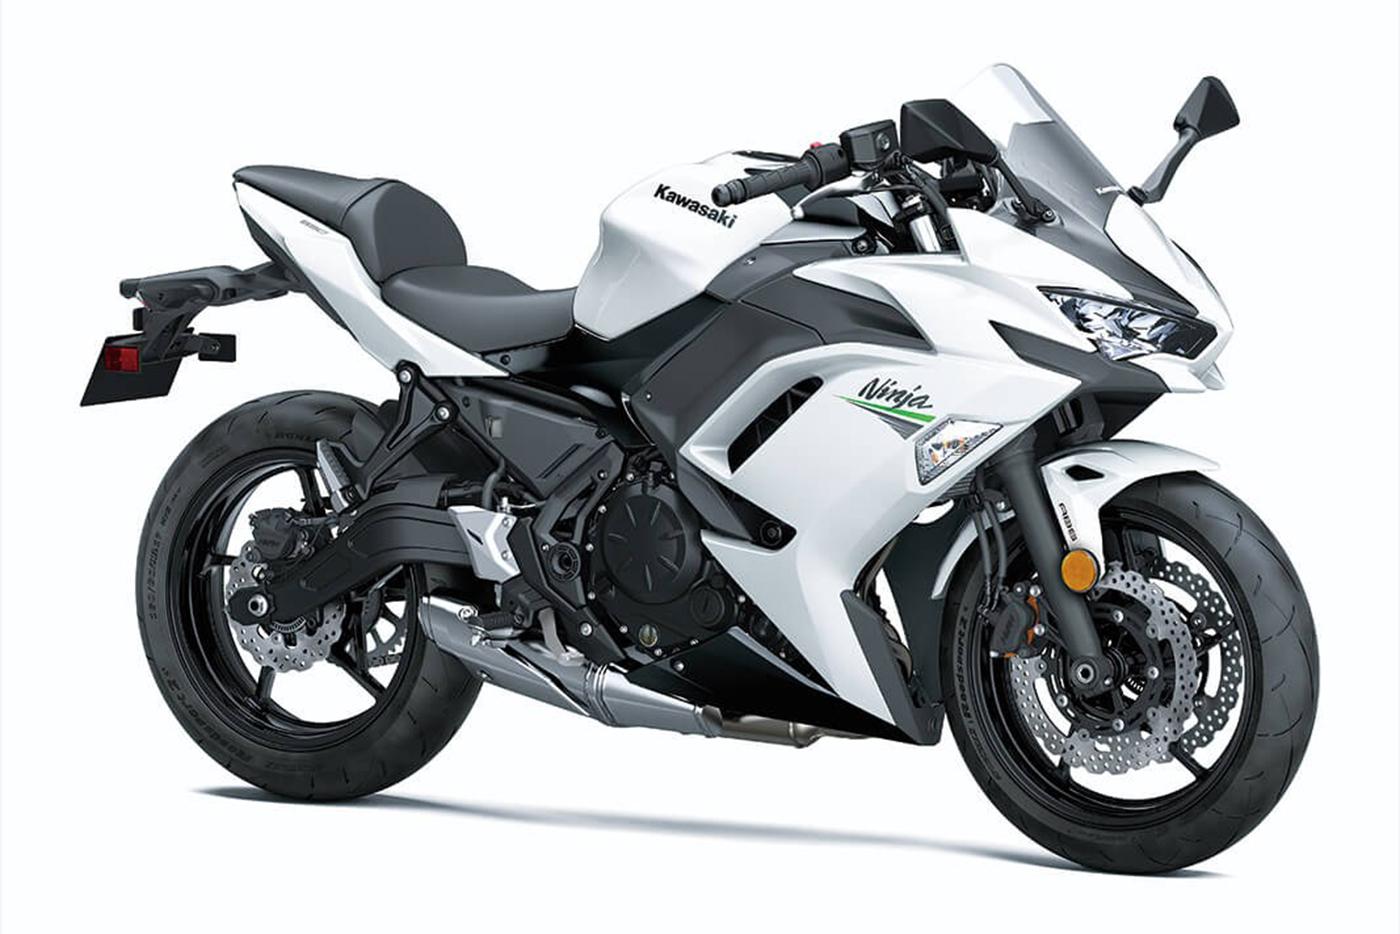 2020-kawasaki-ninja-650-7.jpg